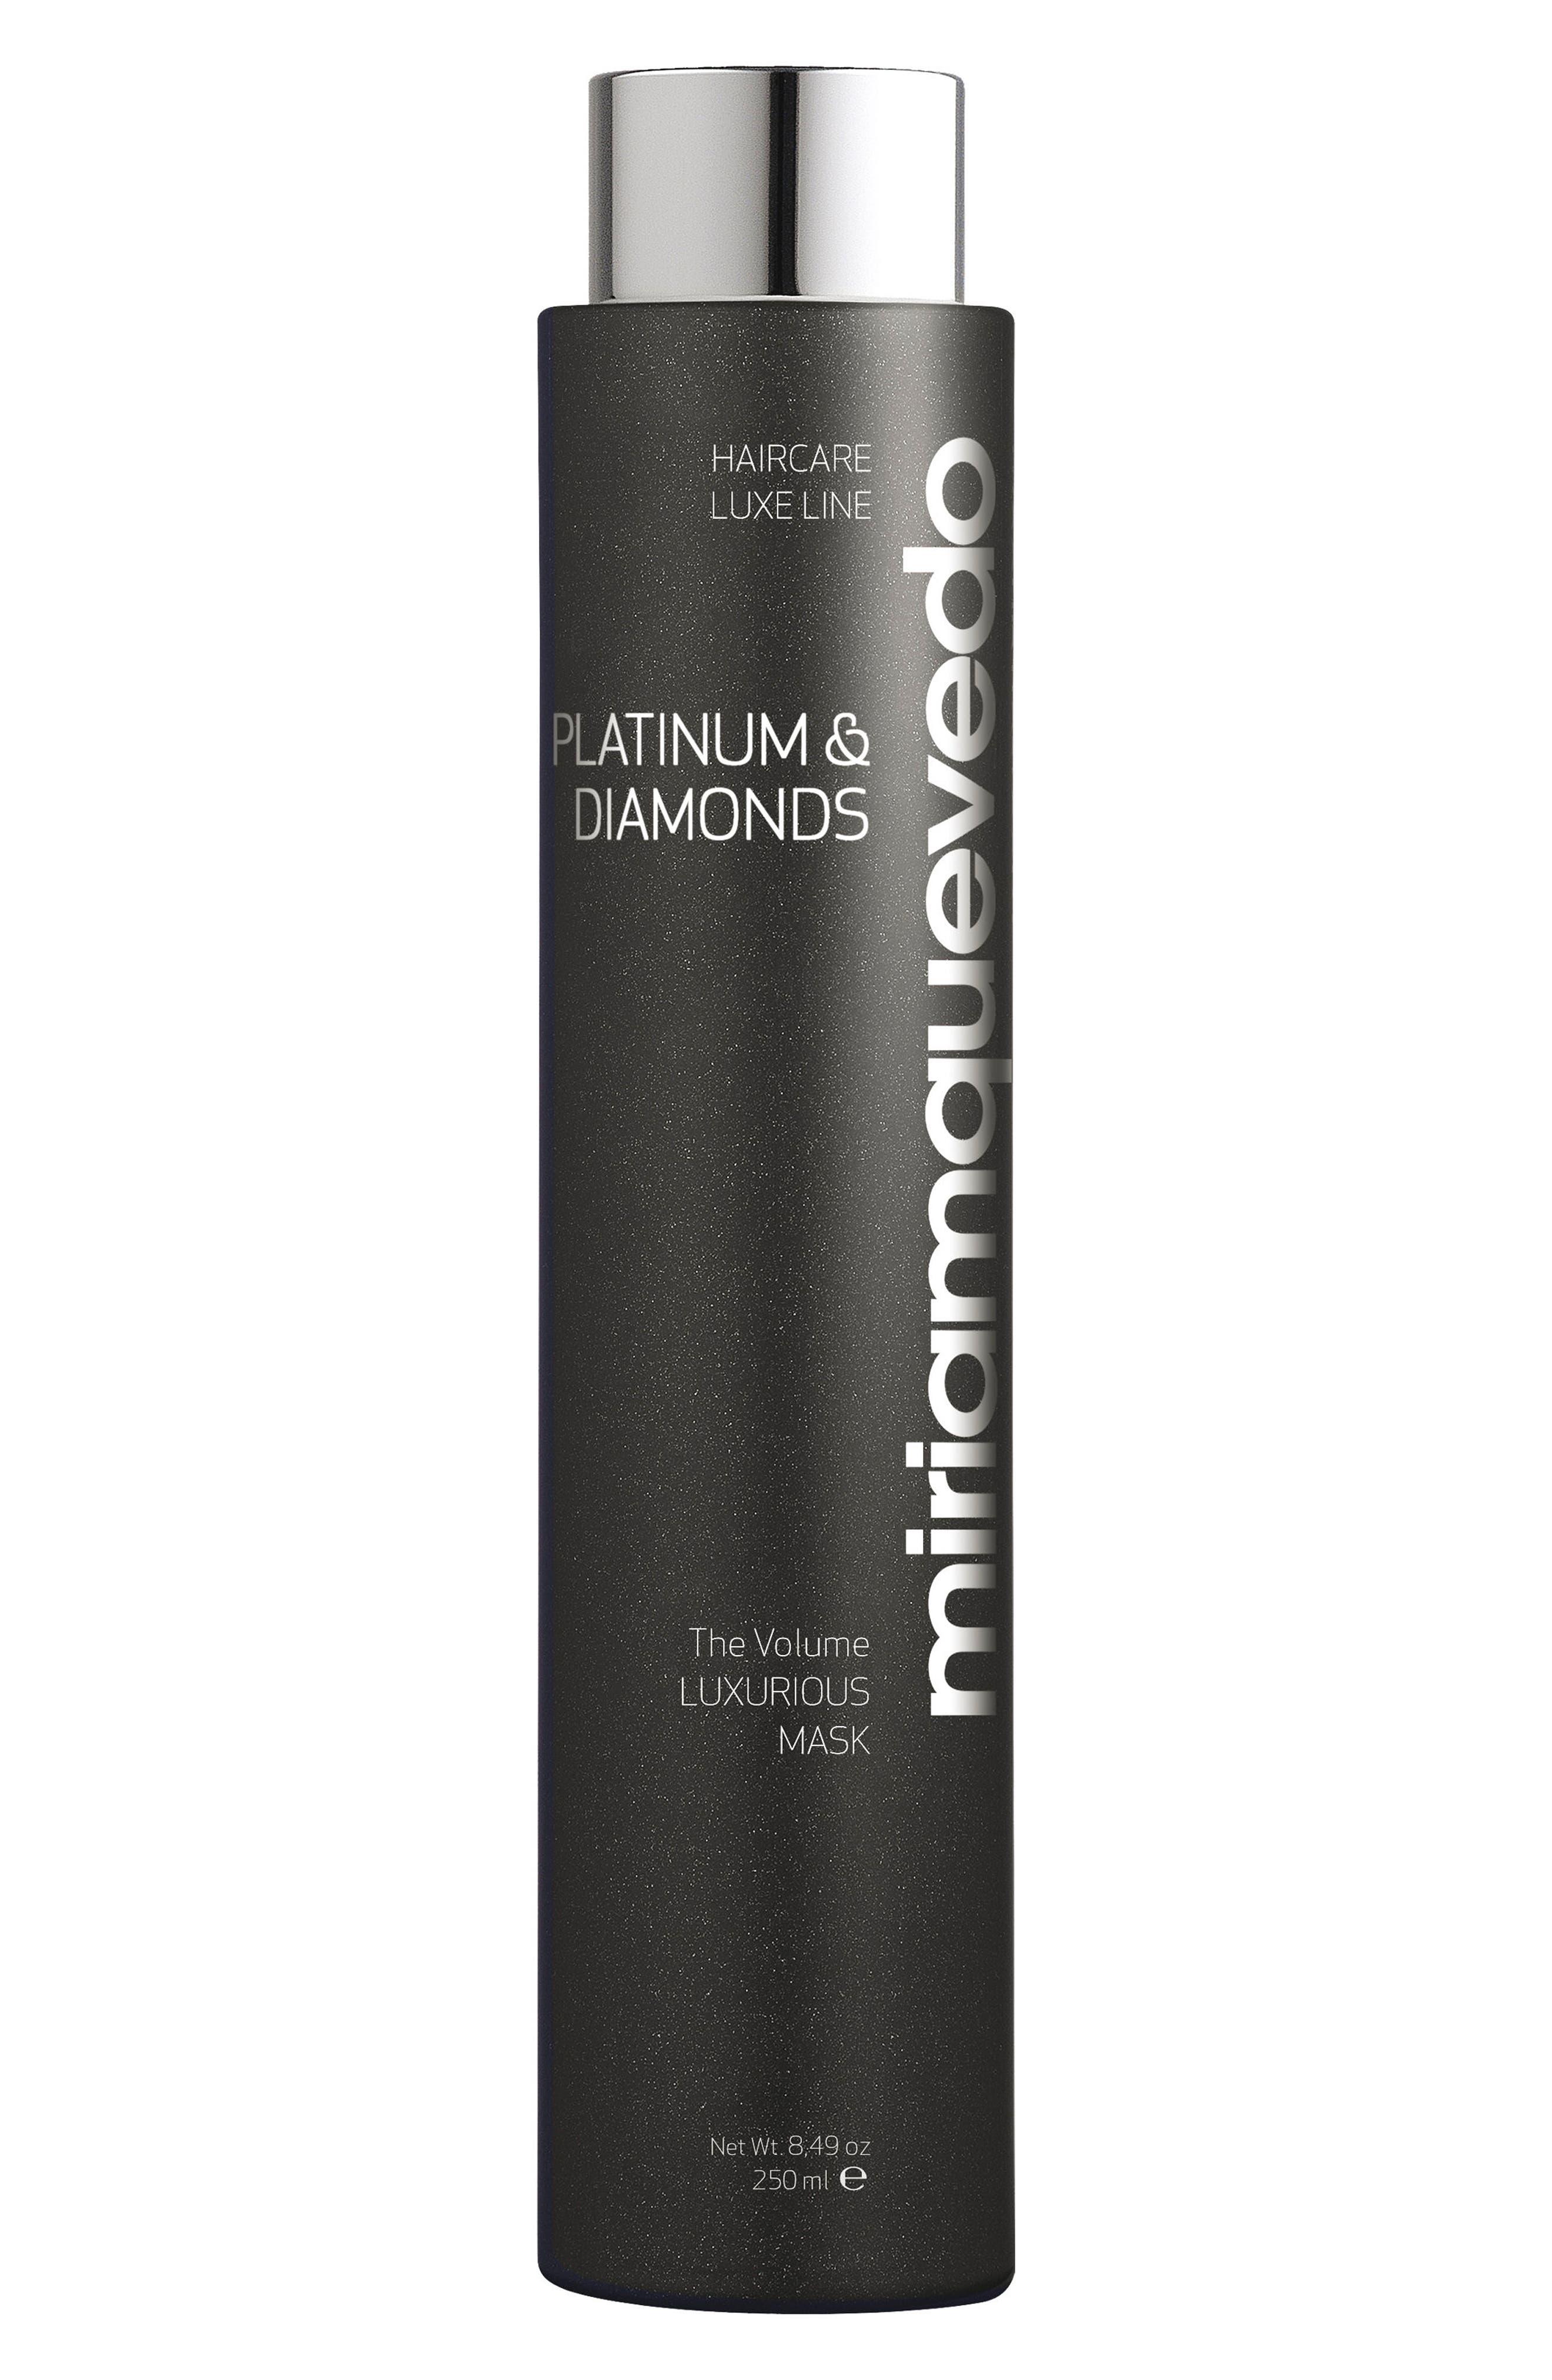 Main Image - SPACE.NK.apothecary Miriam Quevedo Platinum & Diamonds Luxurious Volume Hair Mask